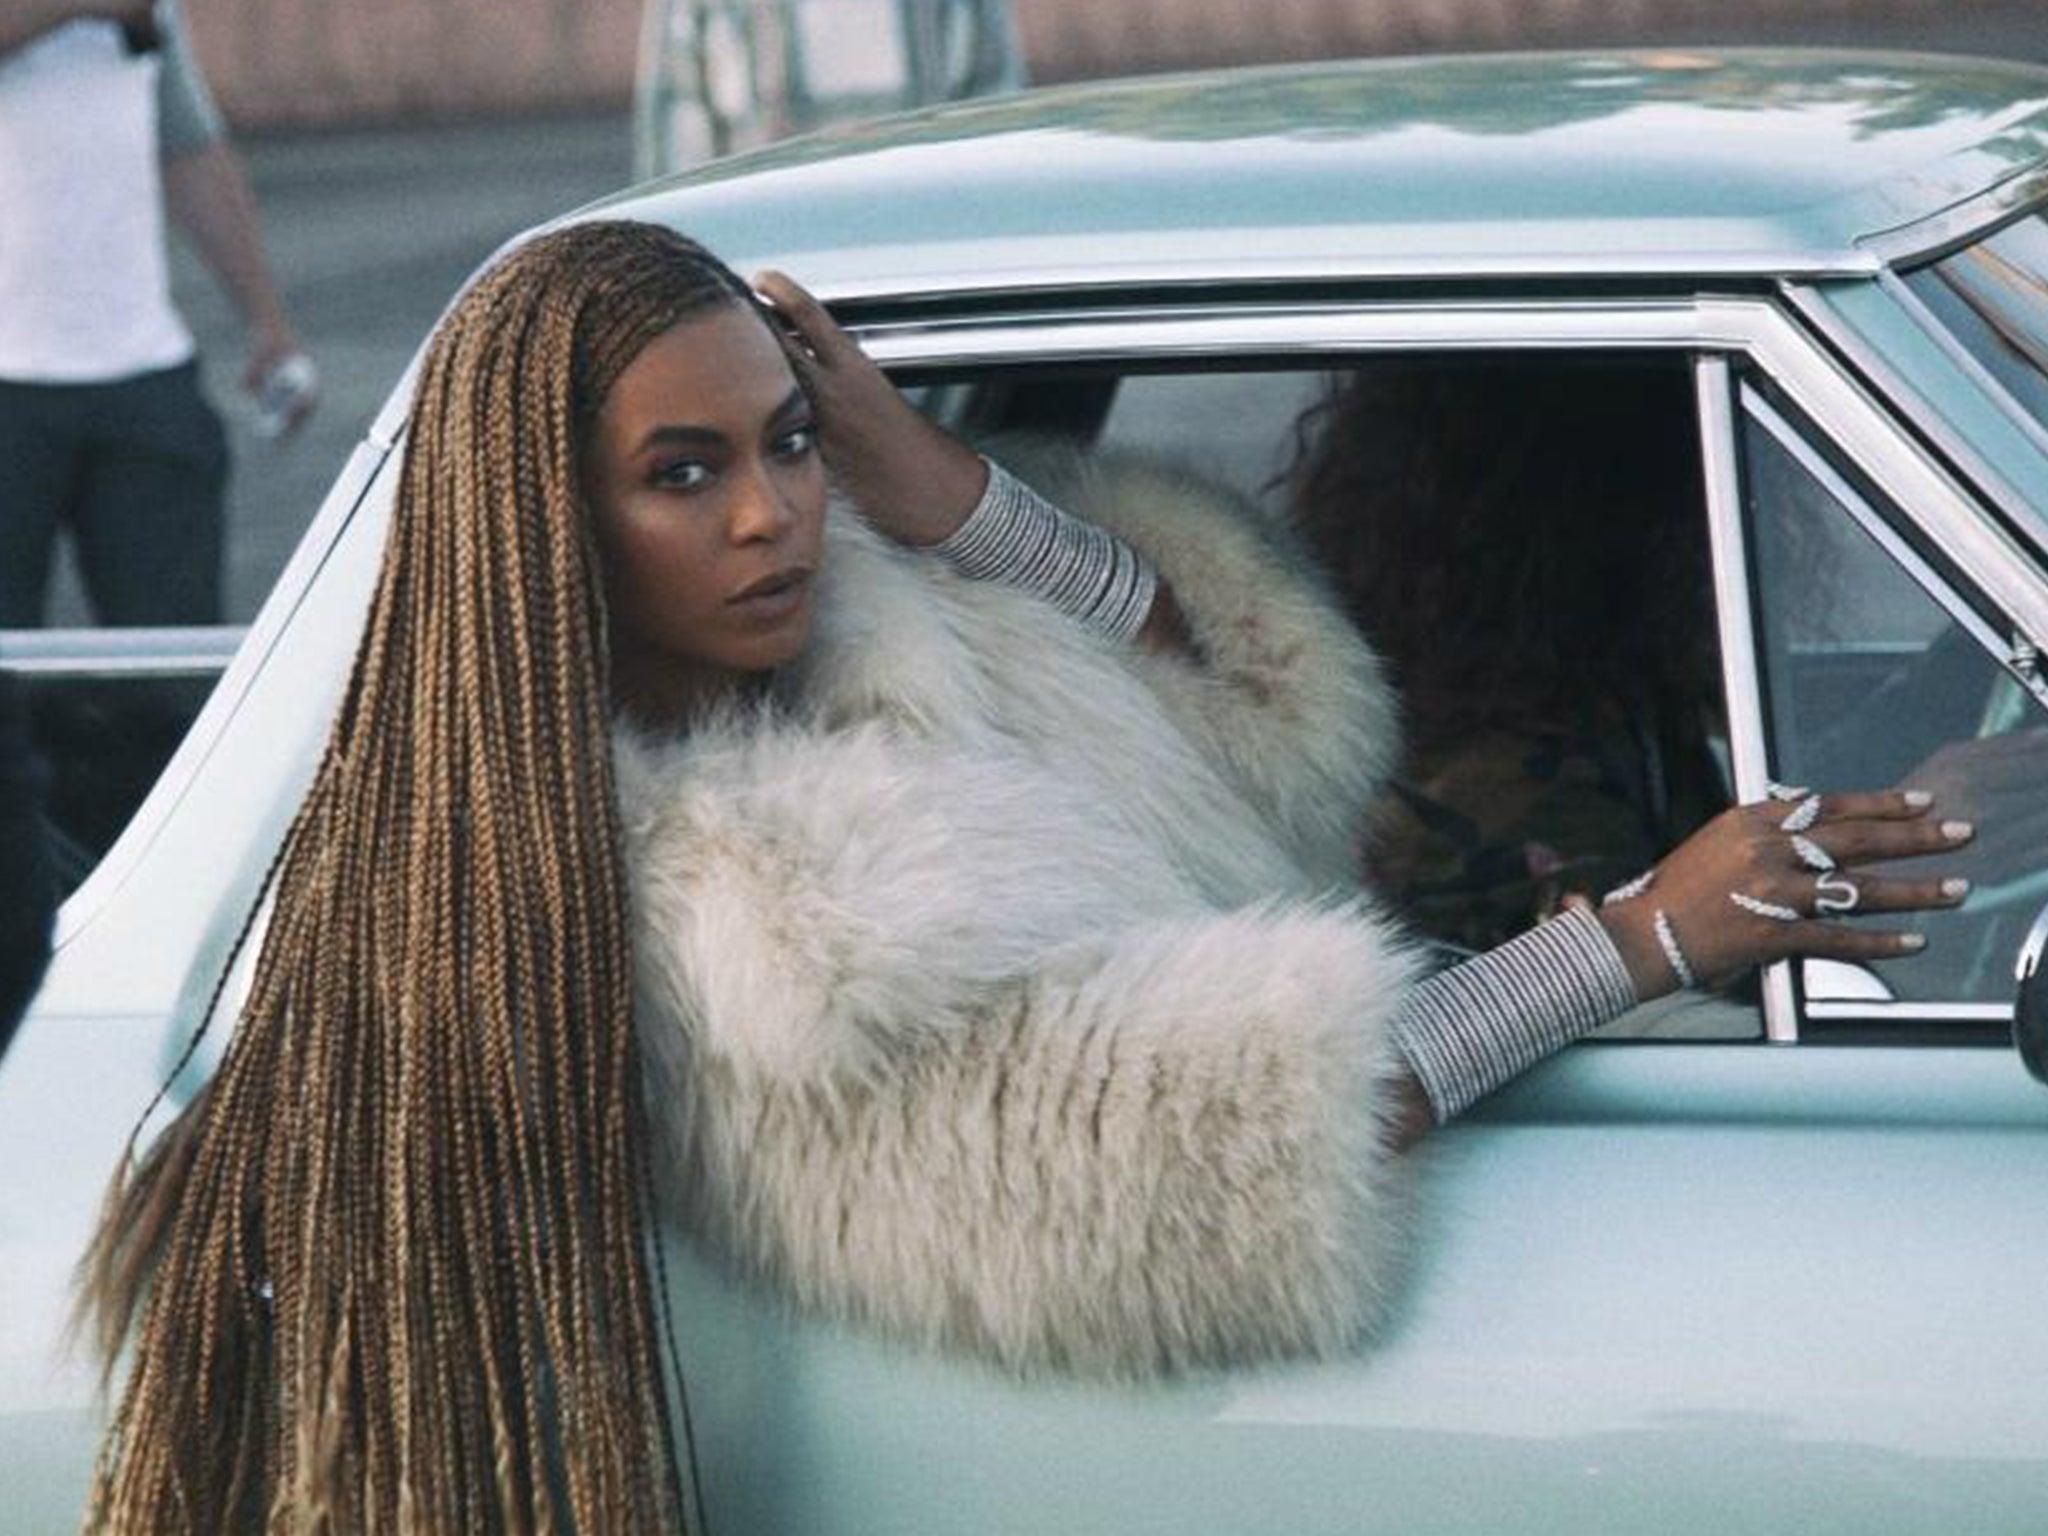 Beyoncé's Lemonade to be released on all streaming platforms